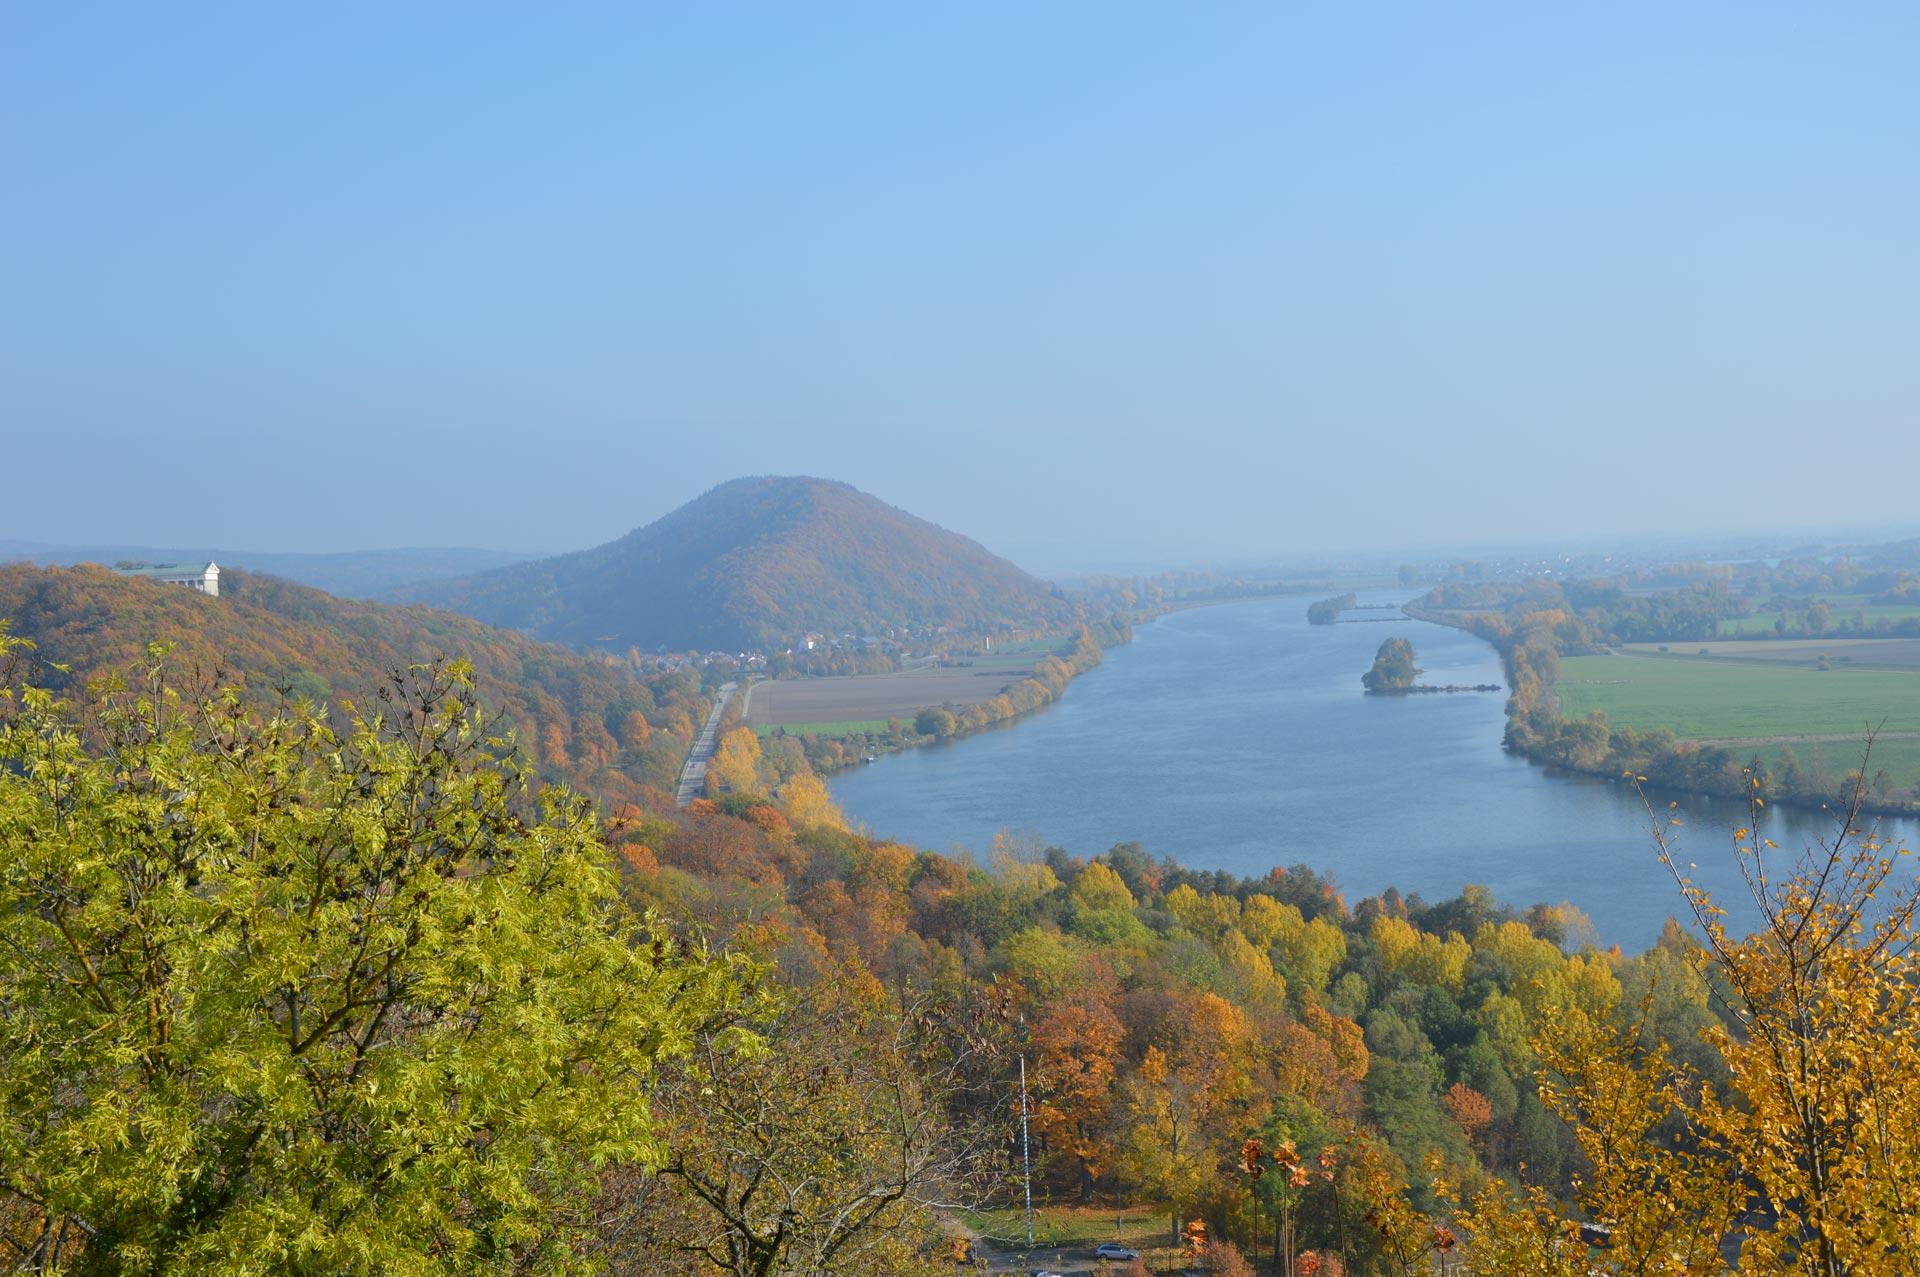 Panorama Blick auf Donau in Richtung Wörth a.D.